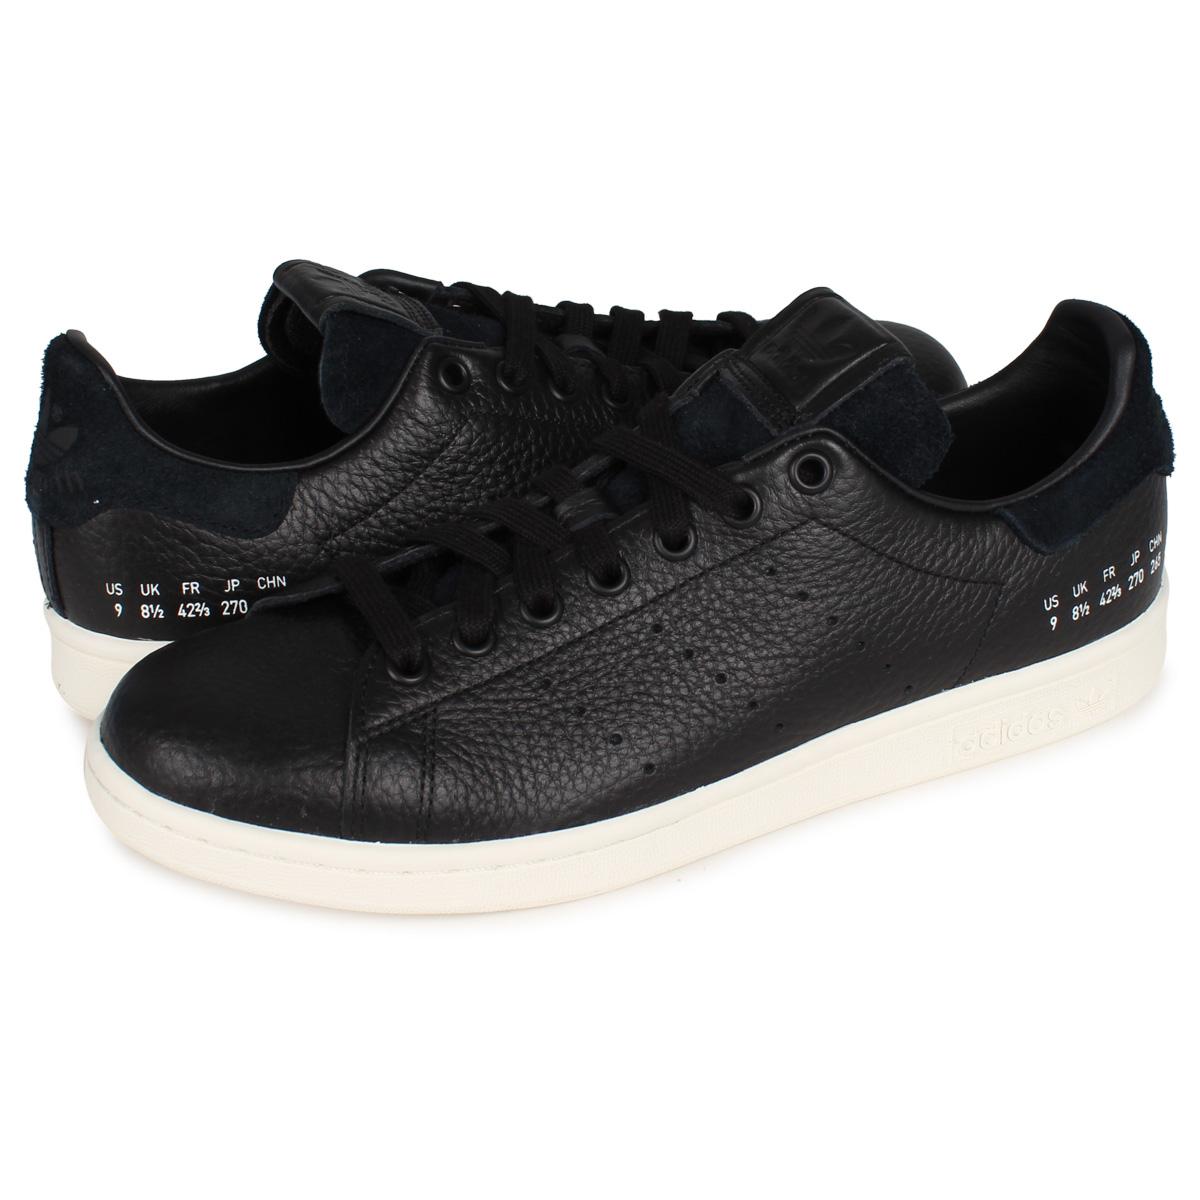 adidas Originals STAN SMITH アディダス オリジナルス スタンスミス スニーカー メンズ レディース ブラック 黒 FY0070:Goods Lab+